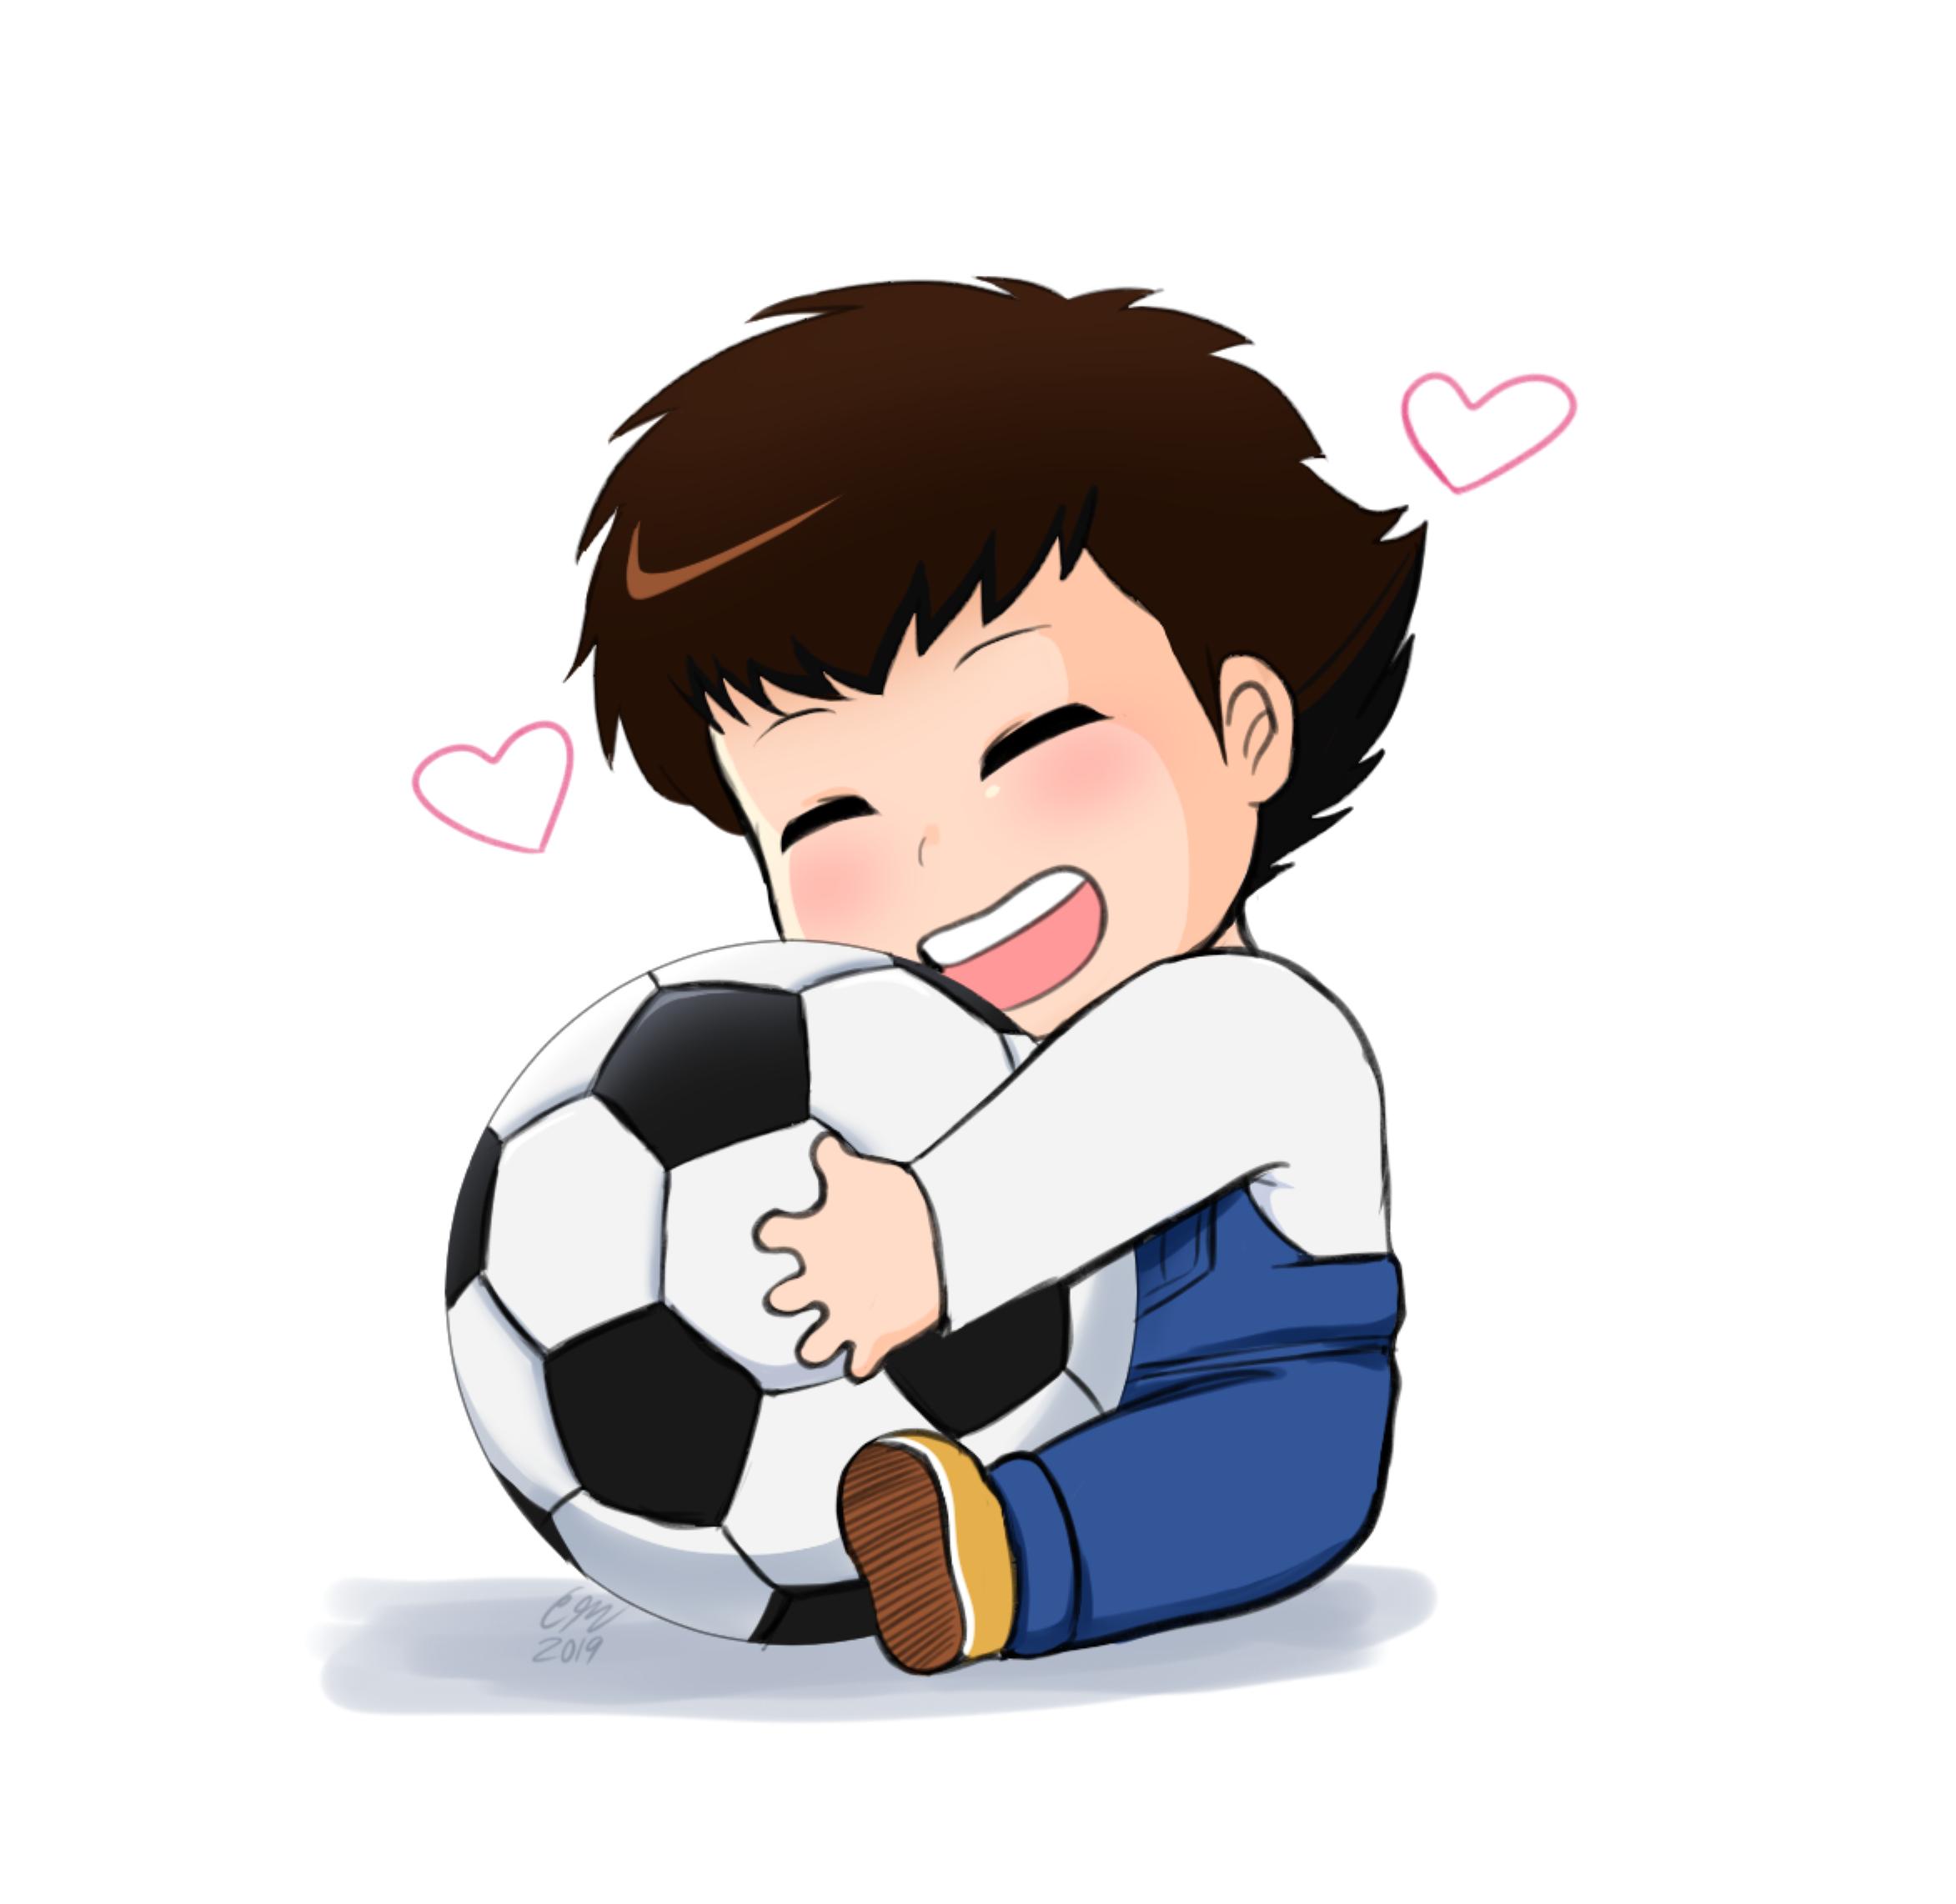 Baby Tsubasa and his Best Friend